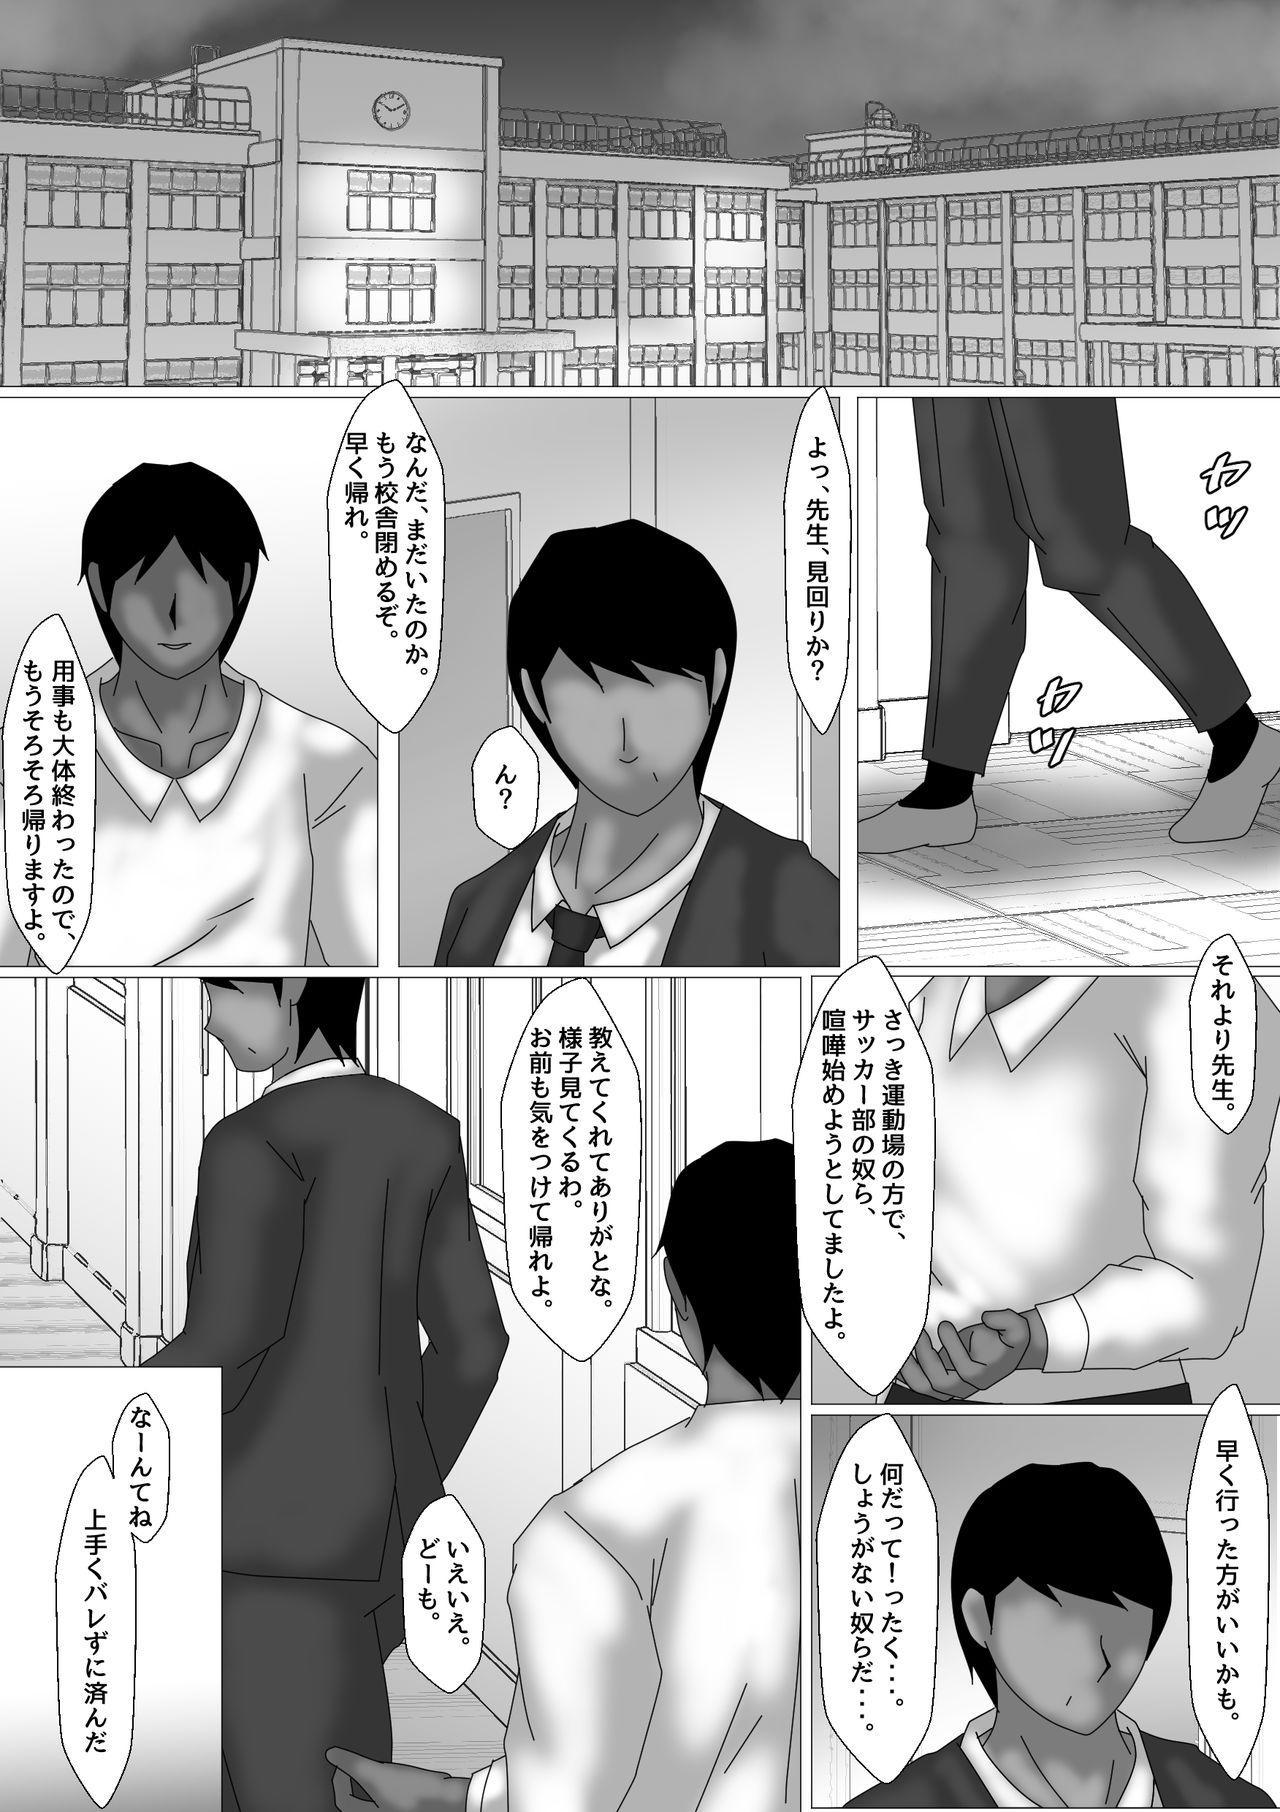 Jokyoushi Shinozaki Rin no Choukyou Kiroku Dai 2 | Female Teacher Rin Shinozaki's Training Record 2 1